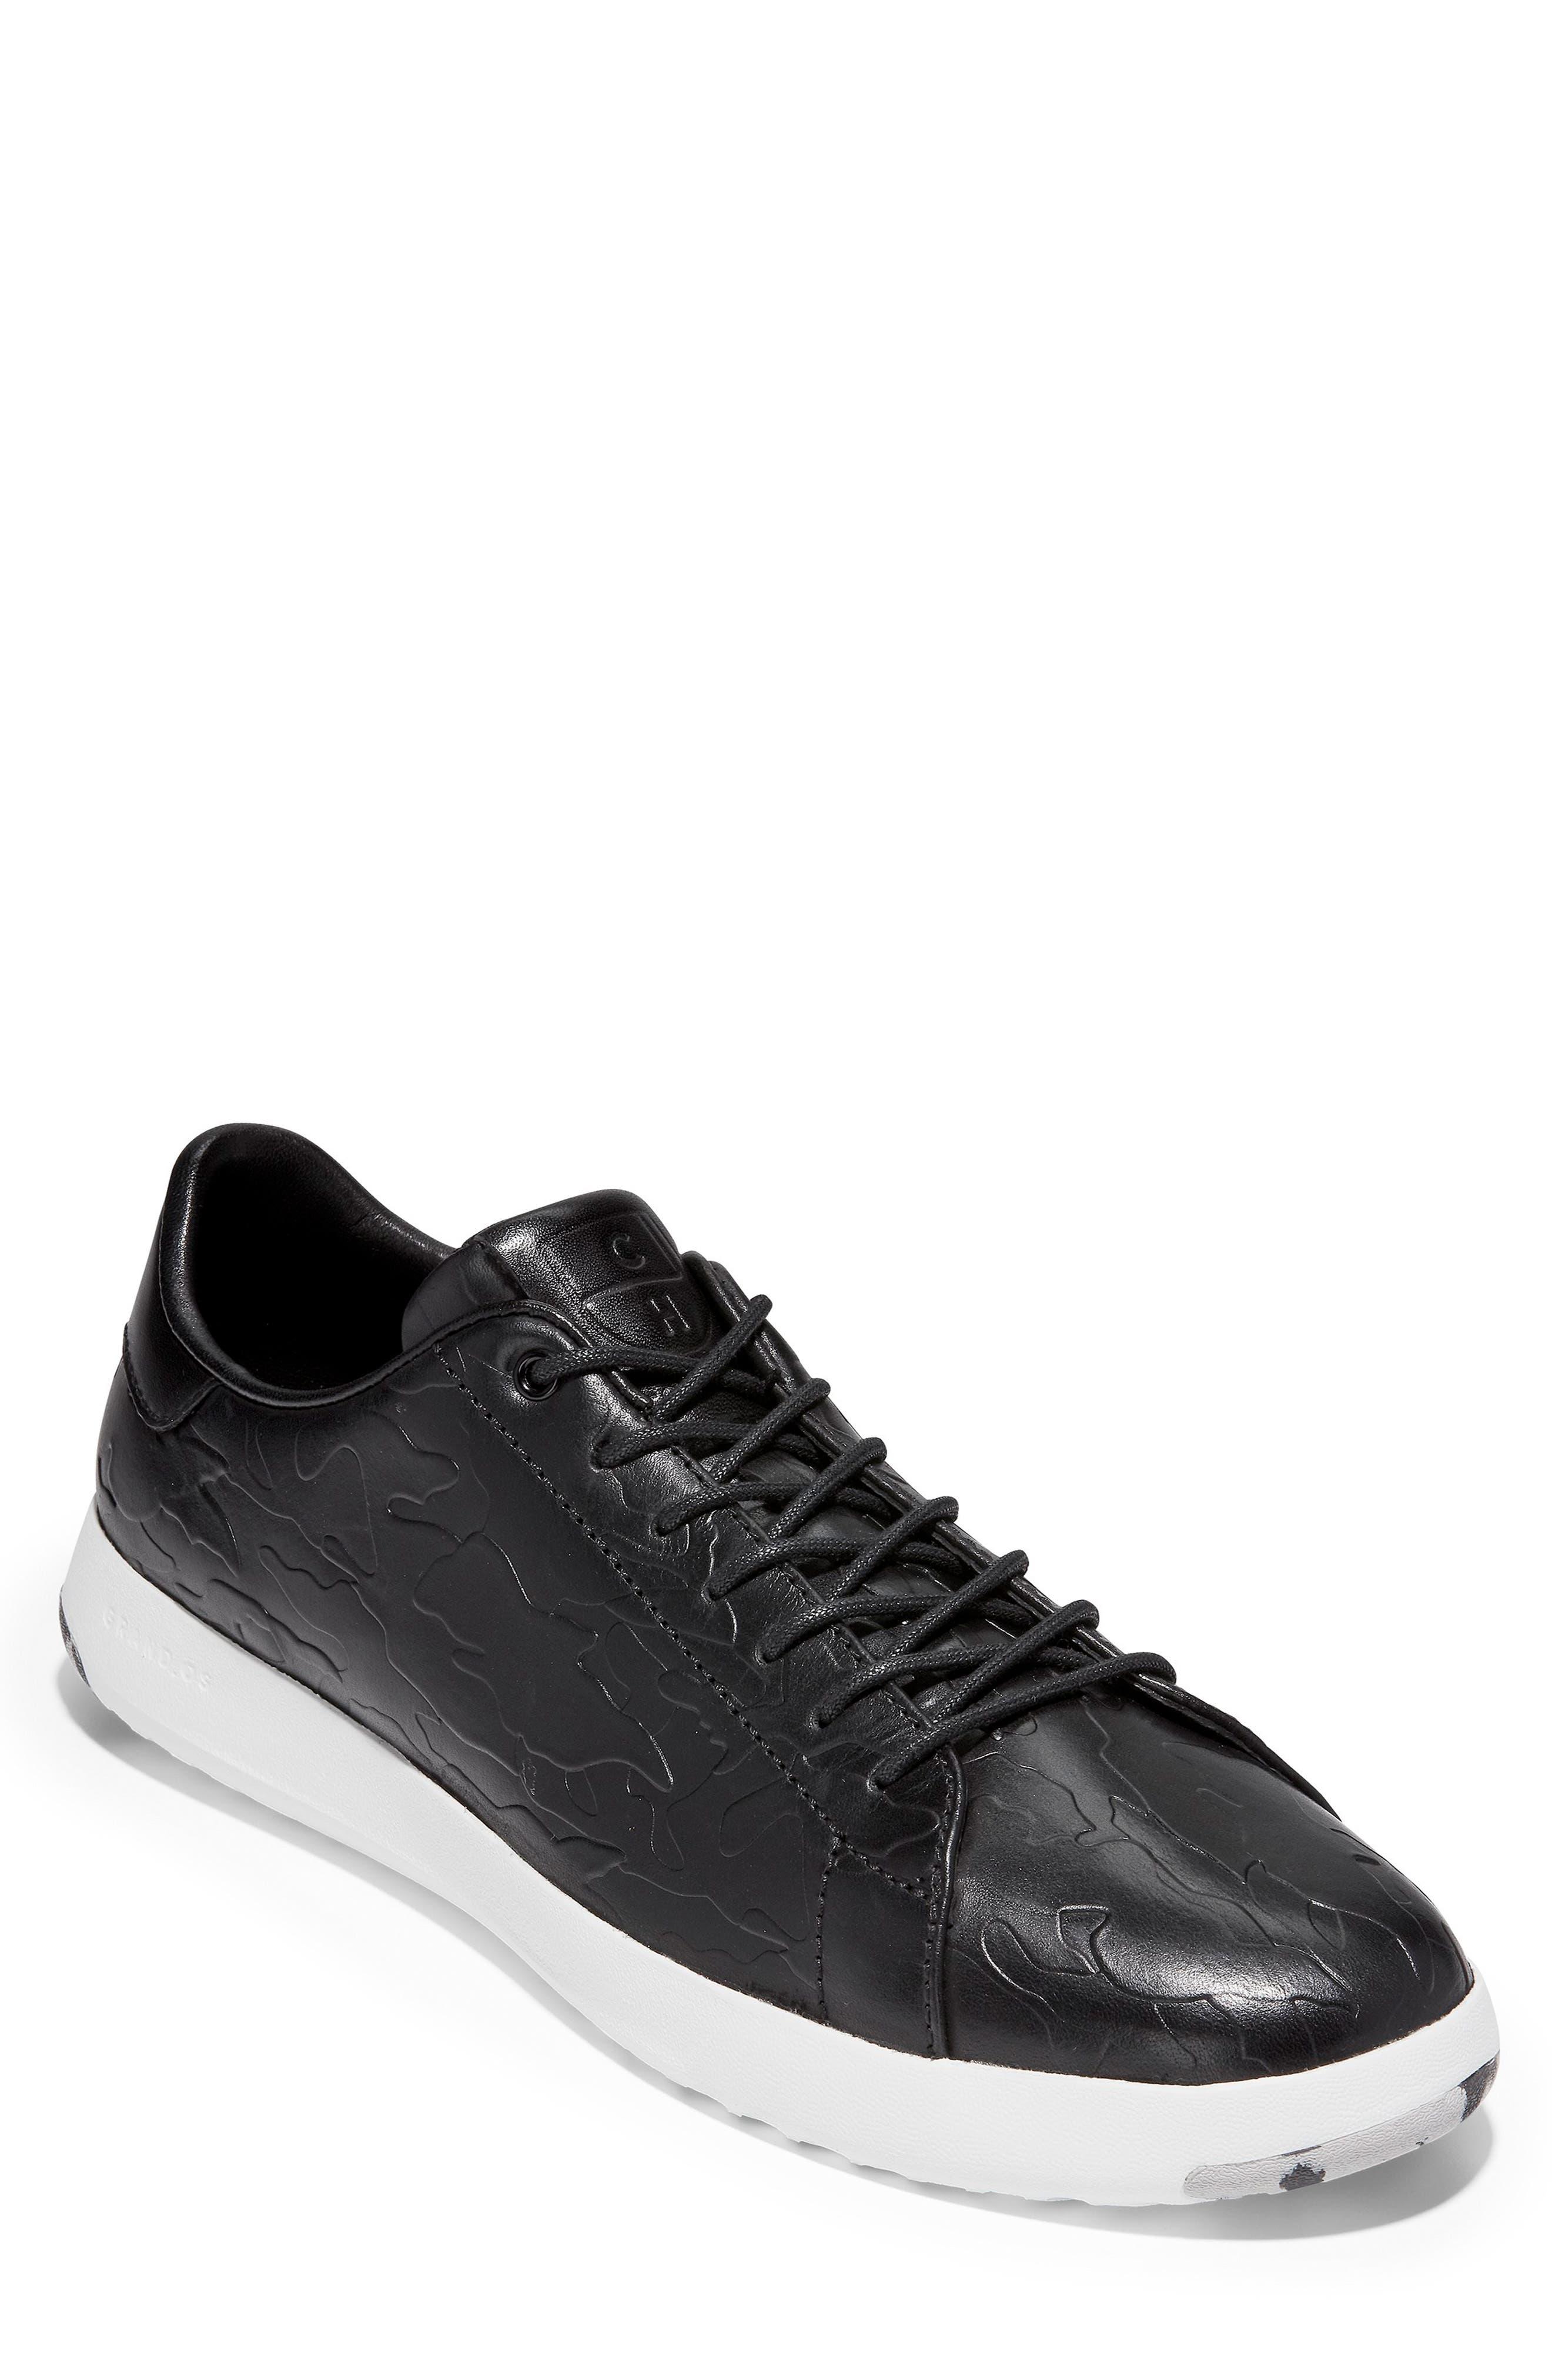 GrandPro Tennis Sneaker,                             Main thumbnail 1, color,                             BLACK/ CAMO LEATHER